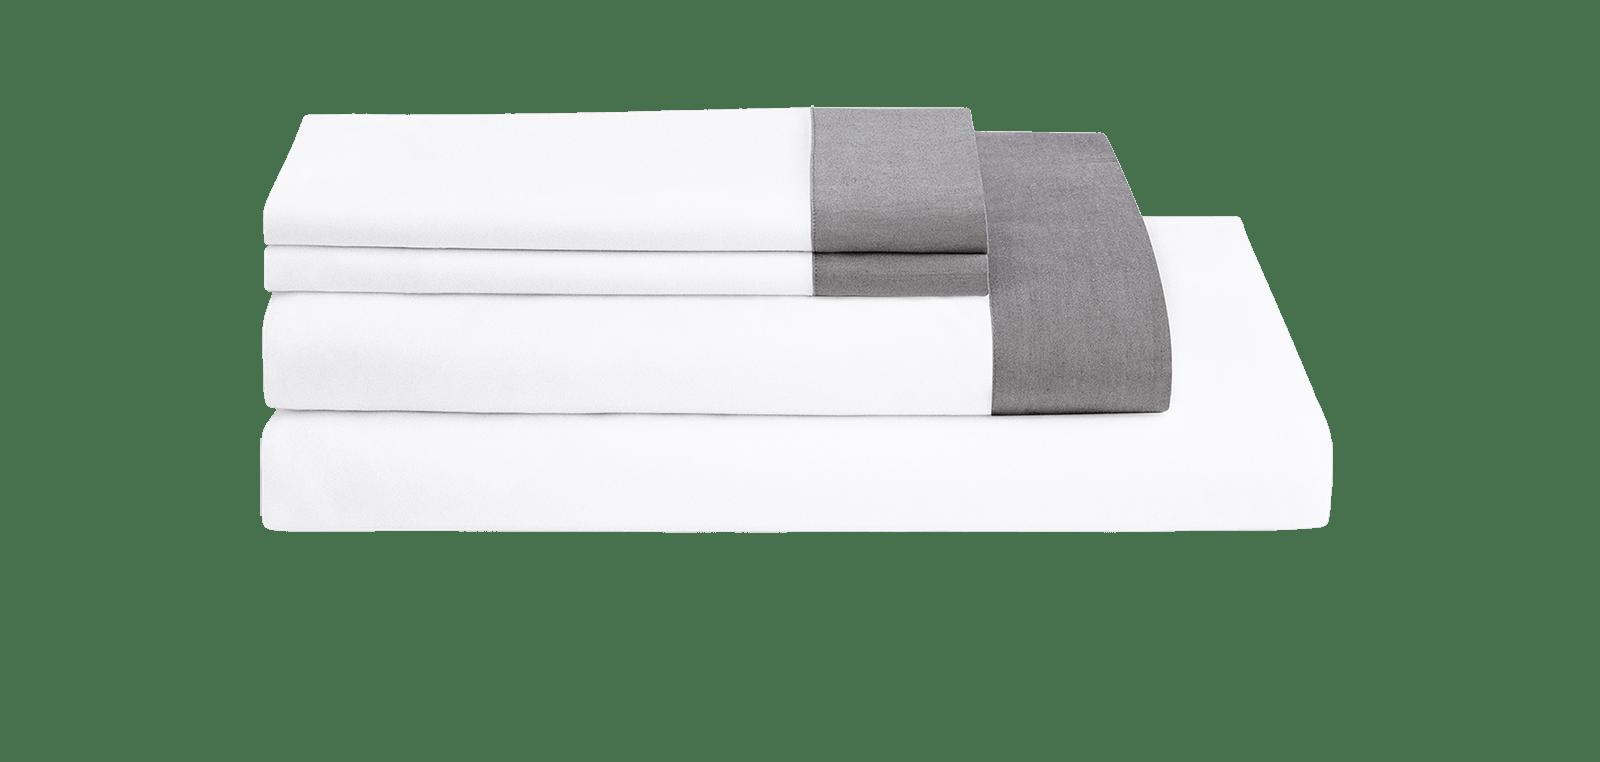 The Casper Sheets